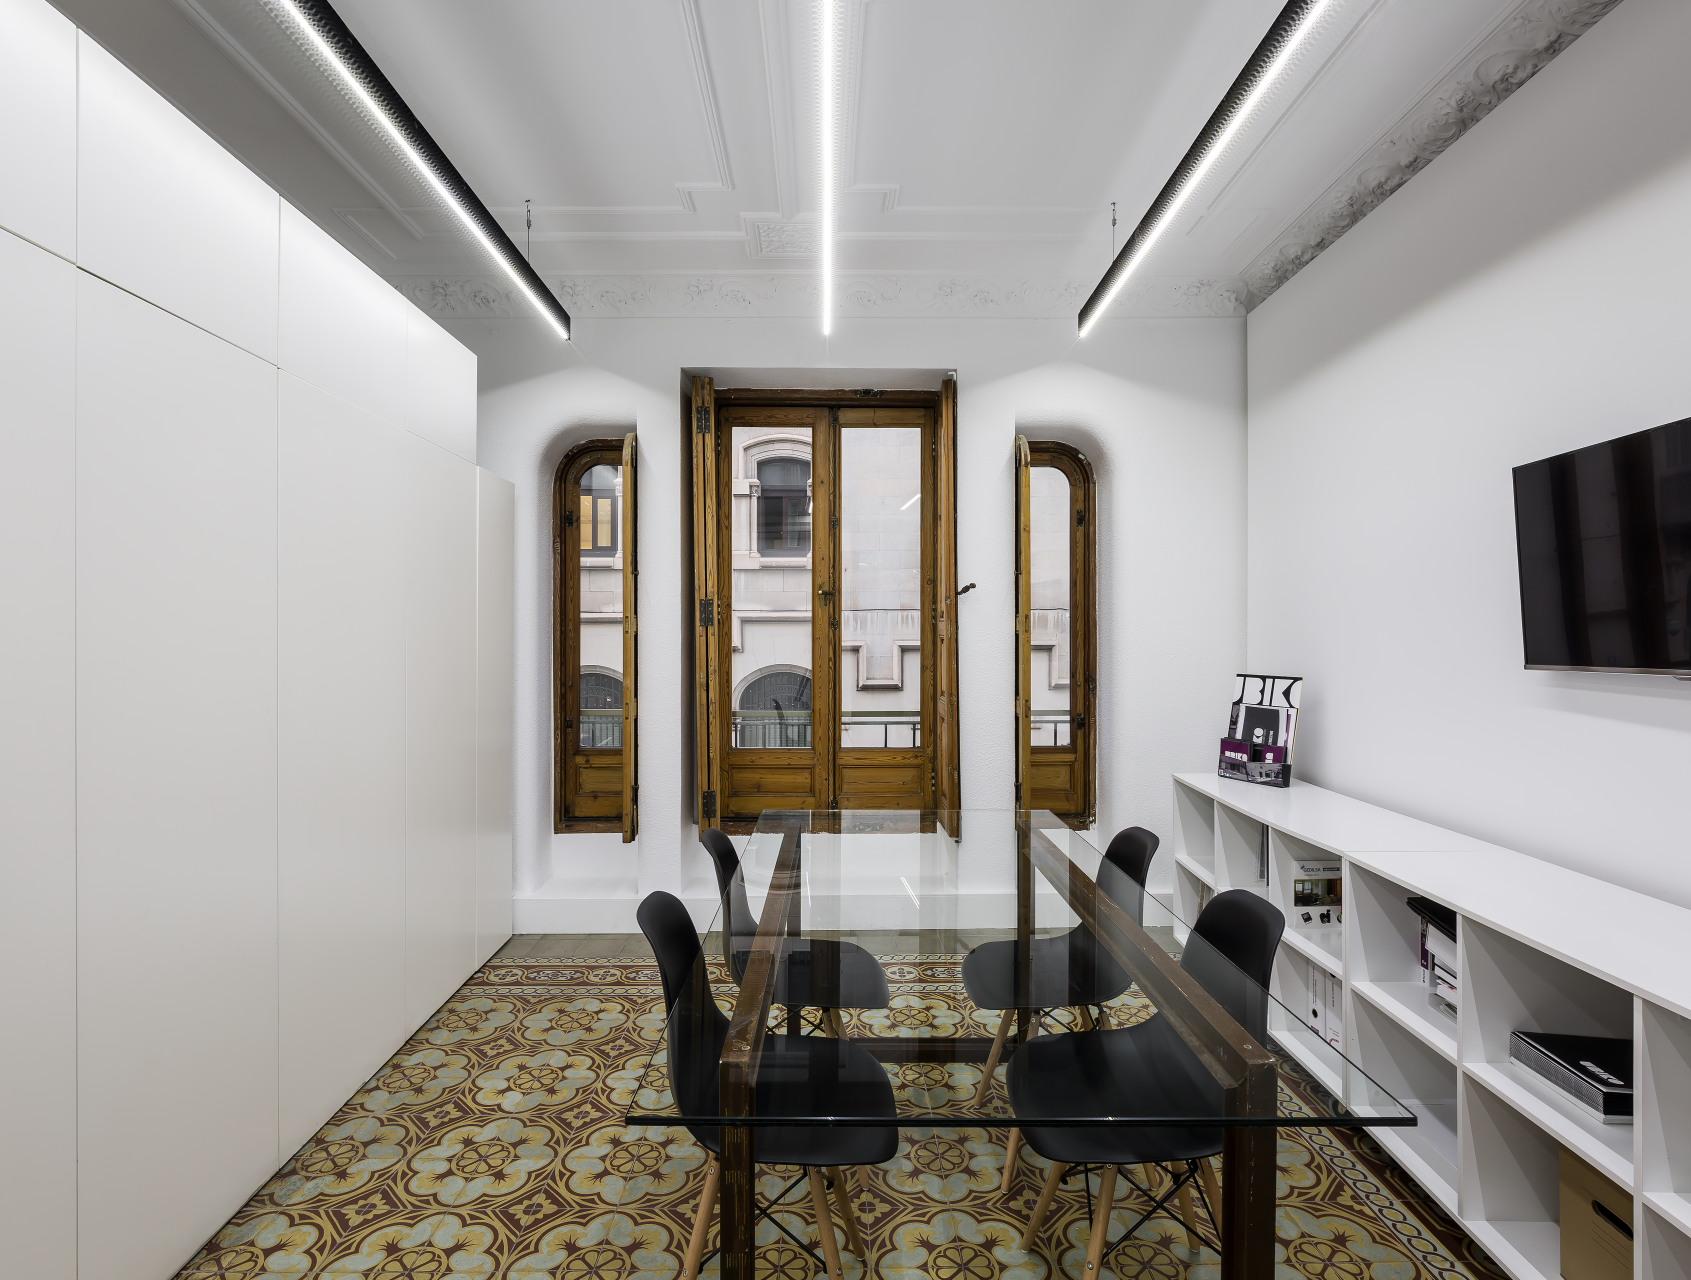 fotografia-arquitectura-interiorismo-valencia-german-cabo-viraje-estudio-pujol (15)